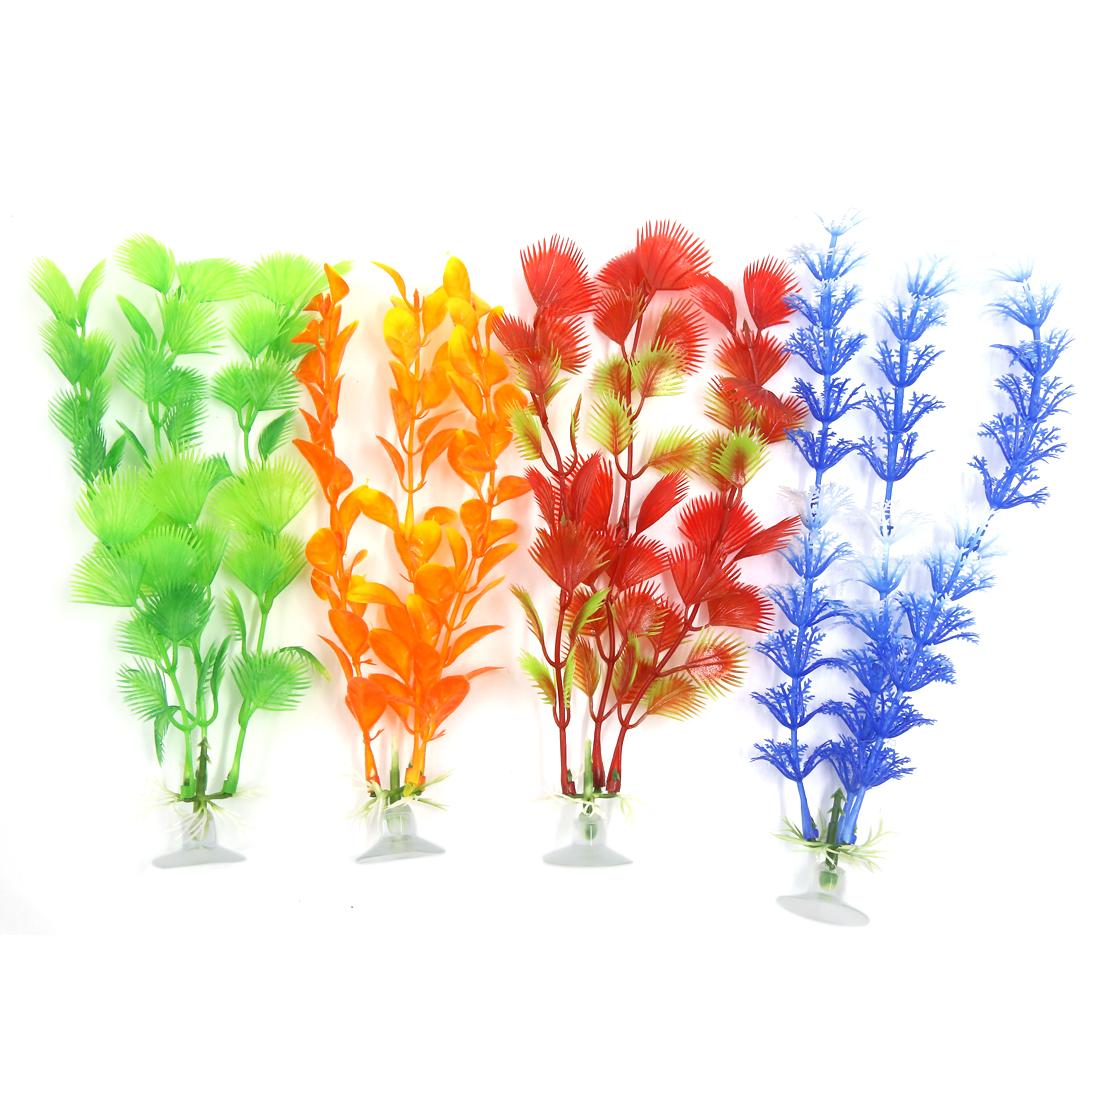 4 Pcs Aqua Fish Tank Ornament Plastic Decoration Plant With Suction Cup